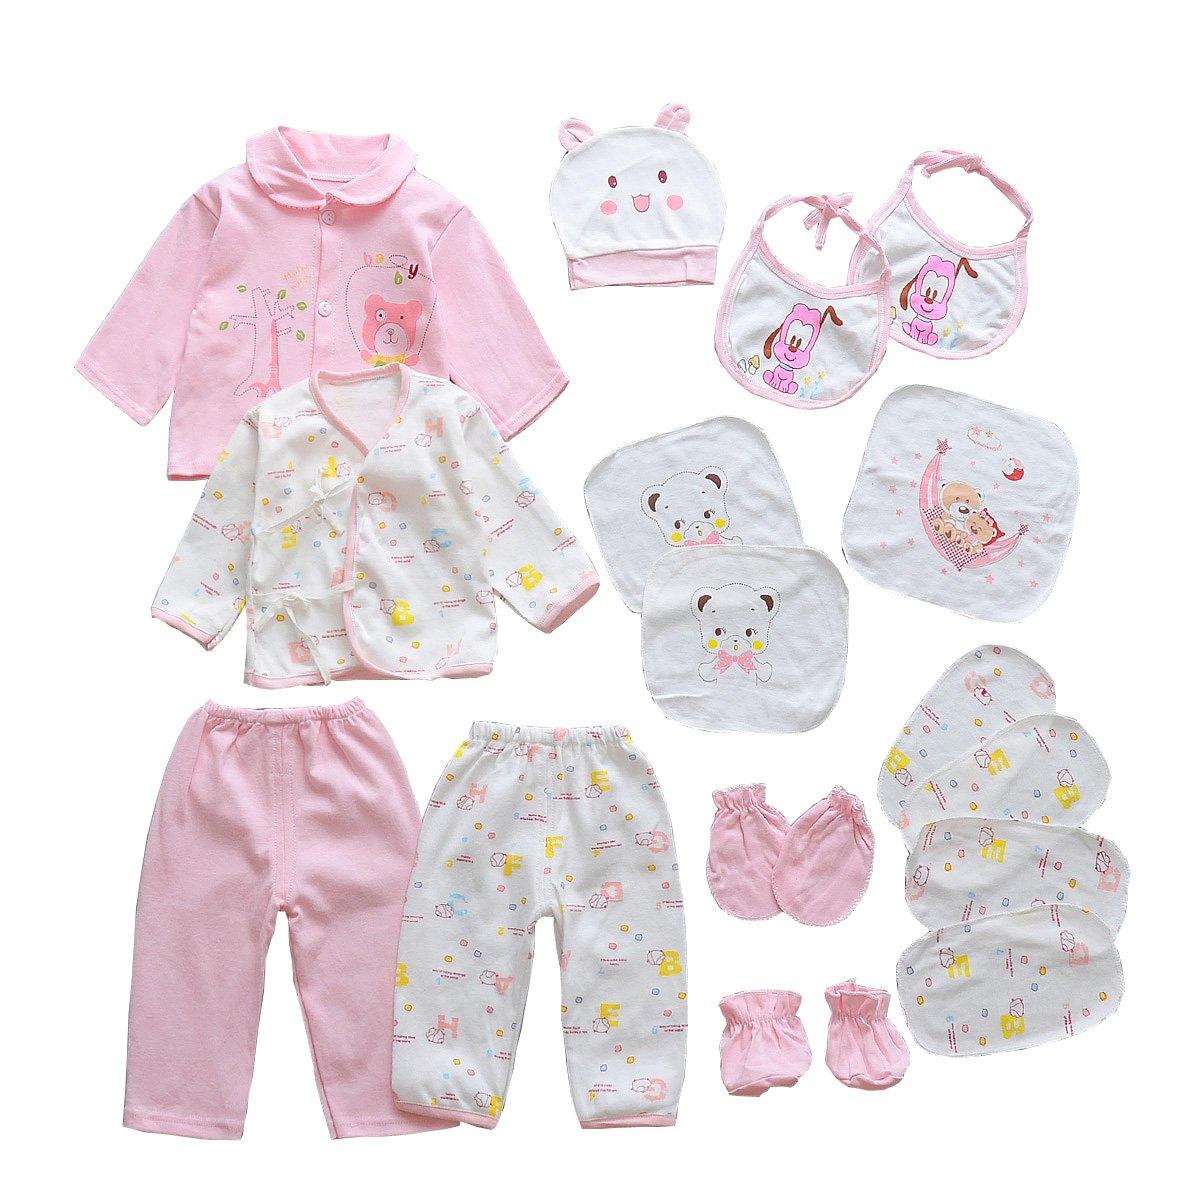 18pcs Unisex Newborn Baby Boy Girl Clothes Sets, 0-6 Months Infant Outfits, Essentials Accessories BV BV-D001-Blue